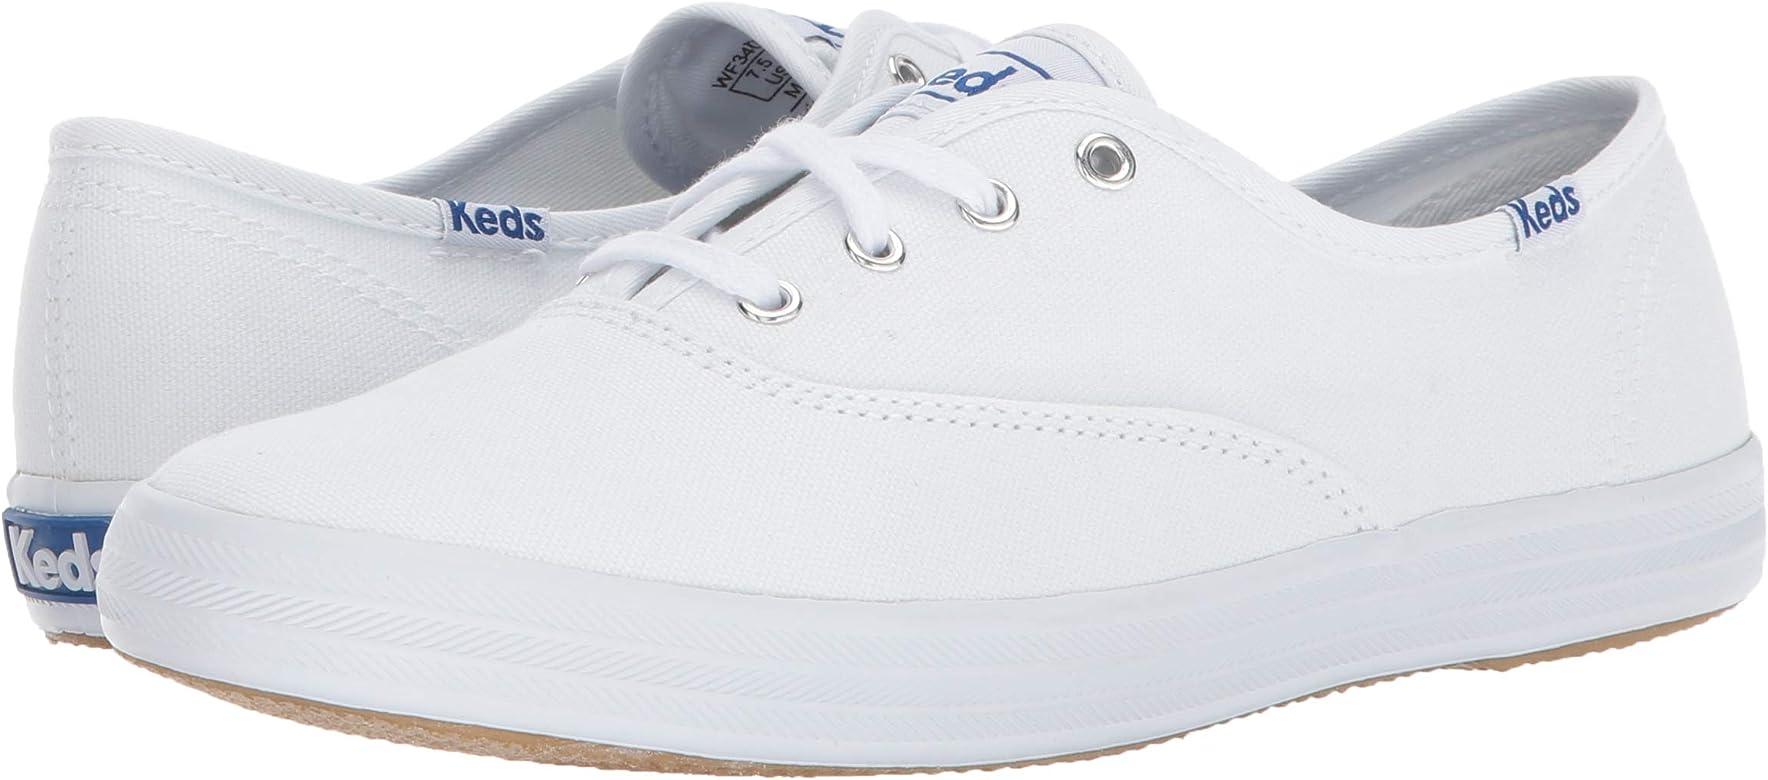 f720e9439ed3 Amazon.com | Keds Women's Champion Original Canvas Sneaker, White ...